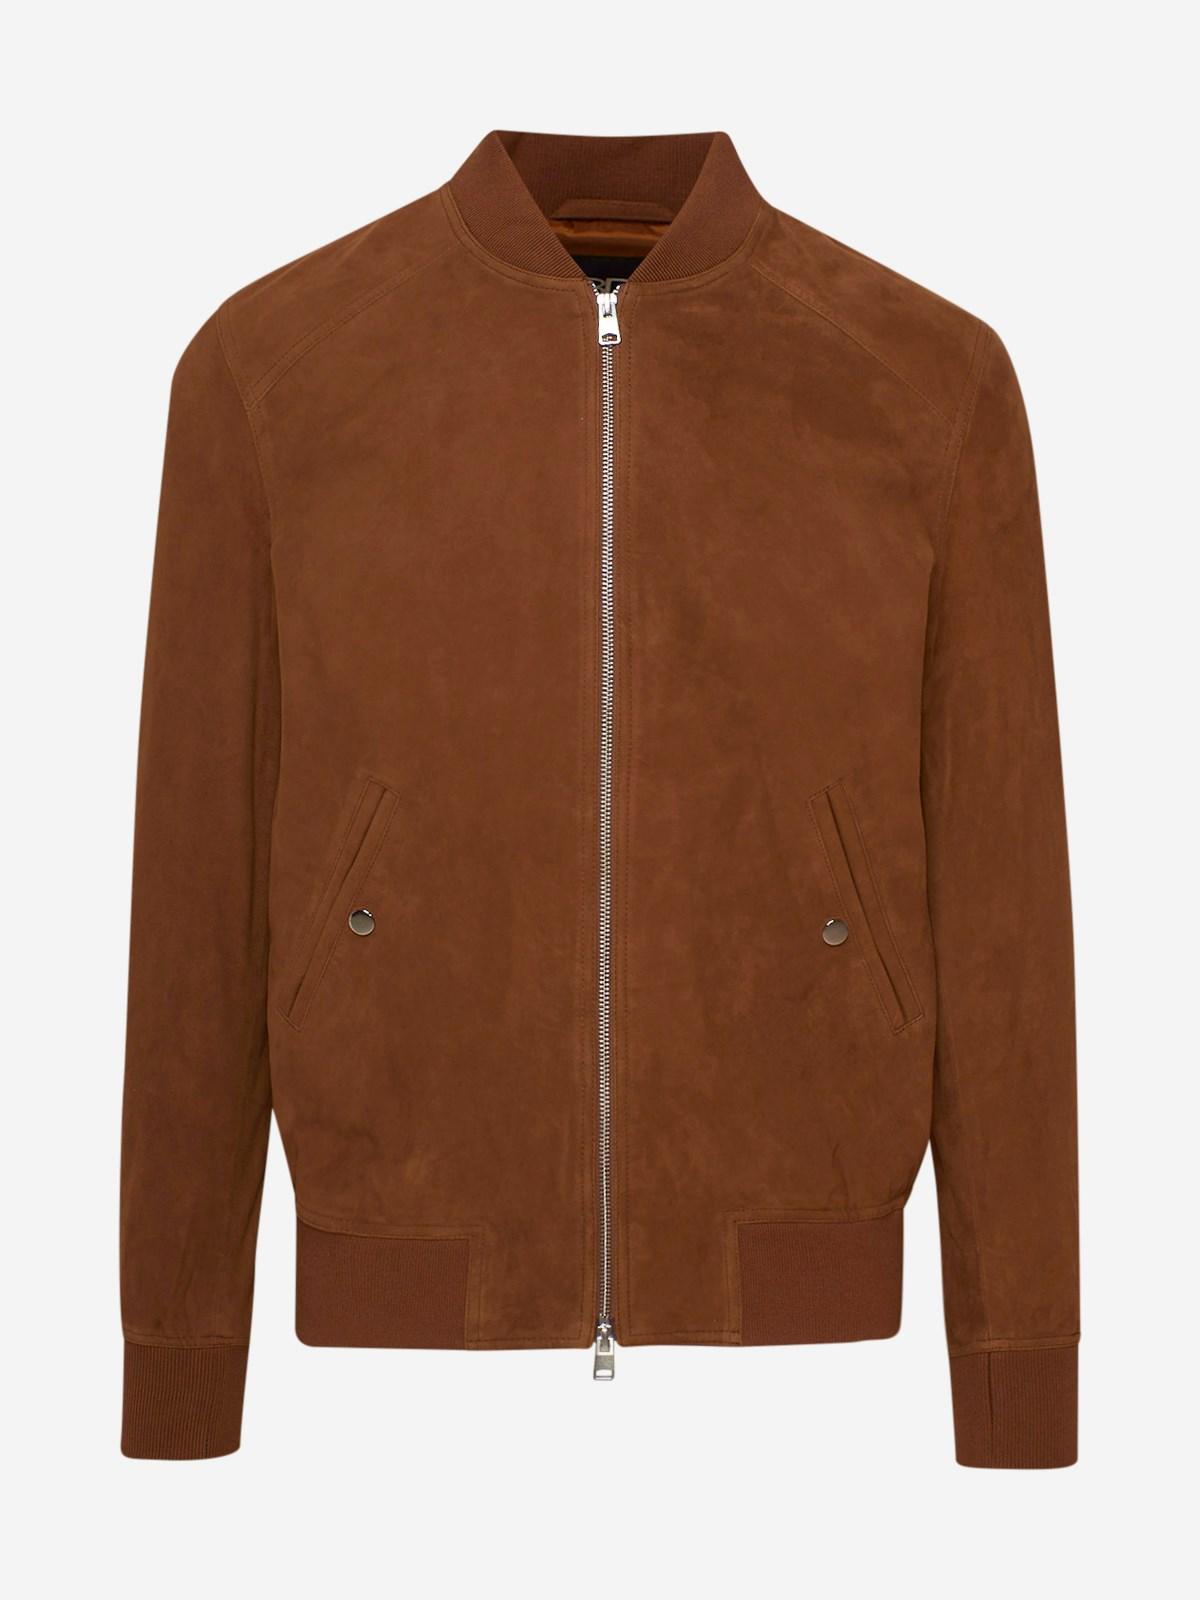 Brian Dales Clothing BROWN JACKET